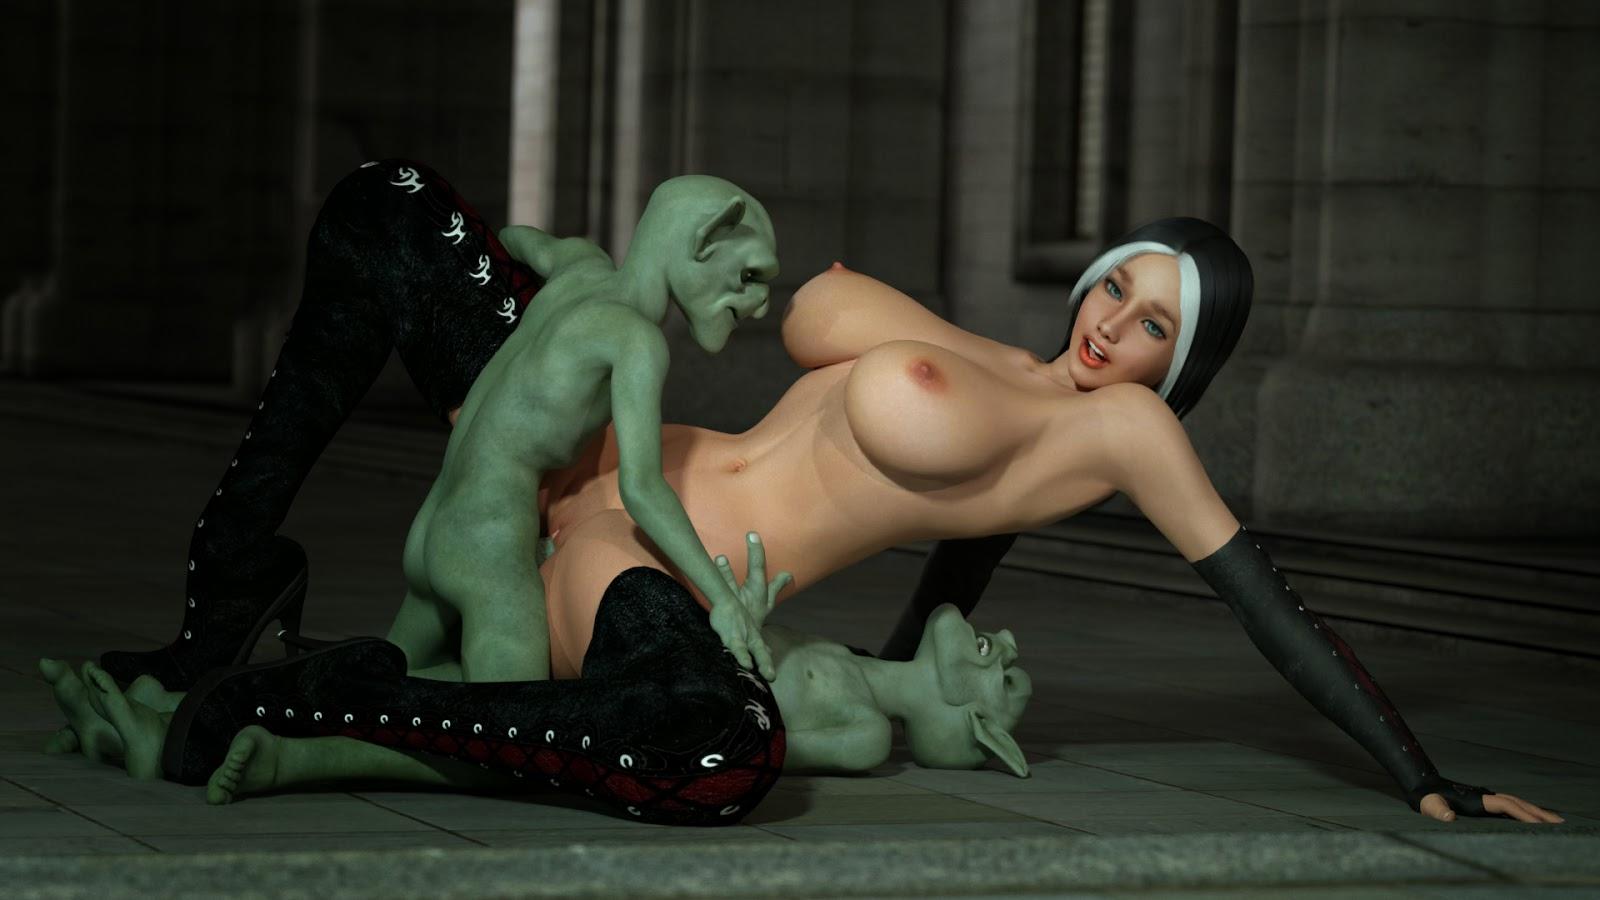 Wallpaper girl hot xxx monsters porncraft clips